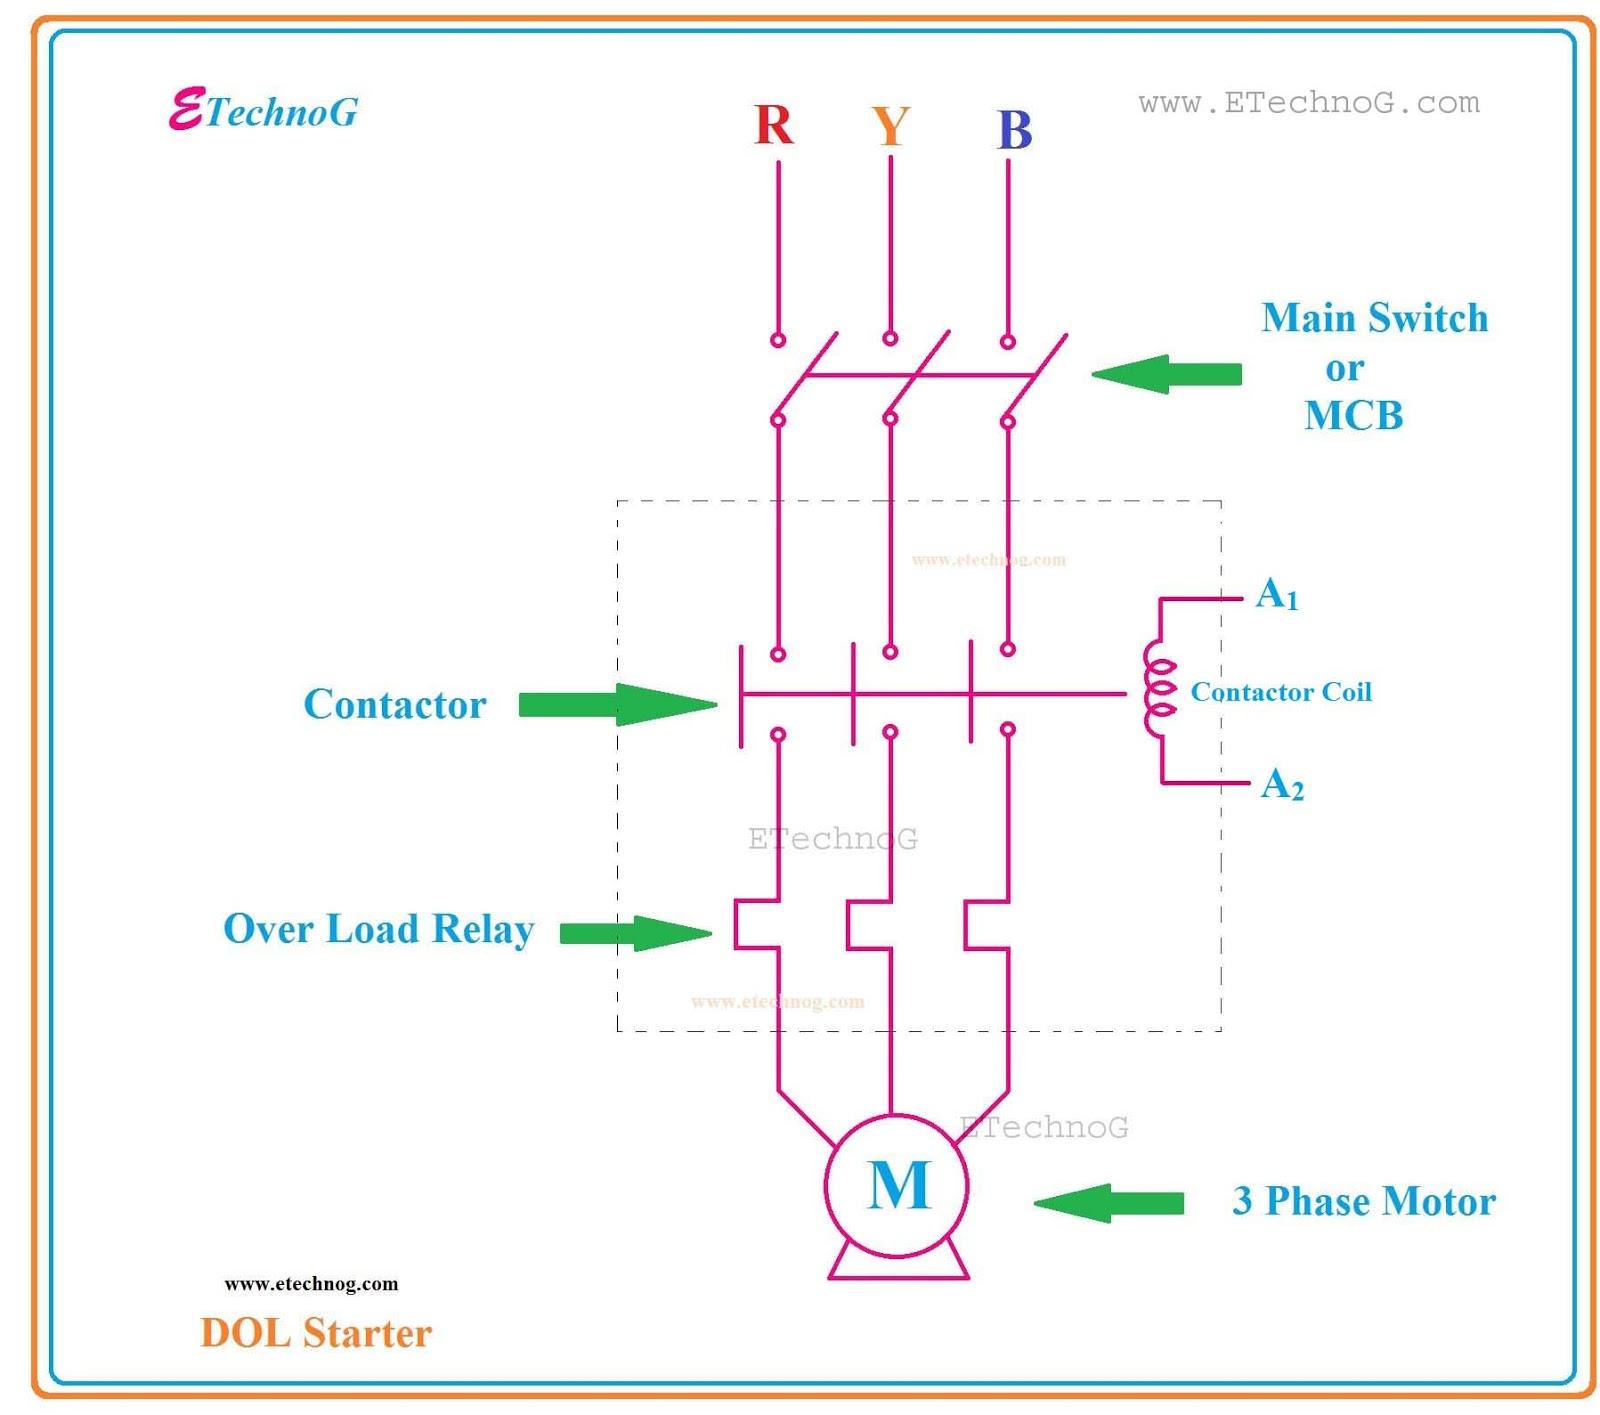 hight resolution of dol starter power circuit diagram dol starter diagram